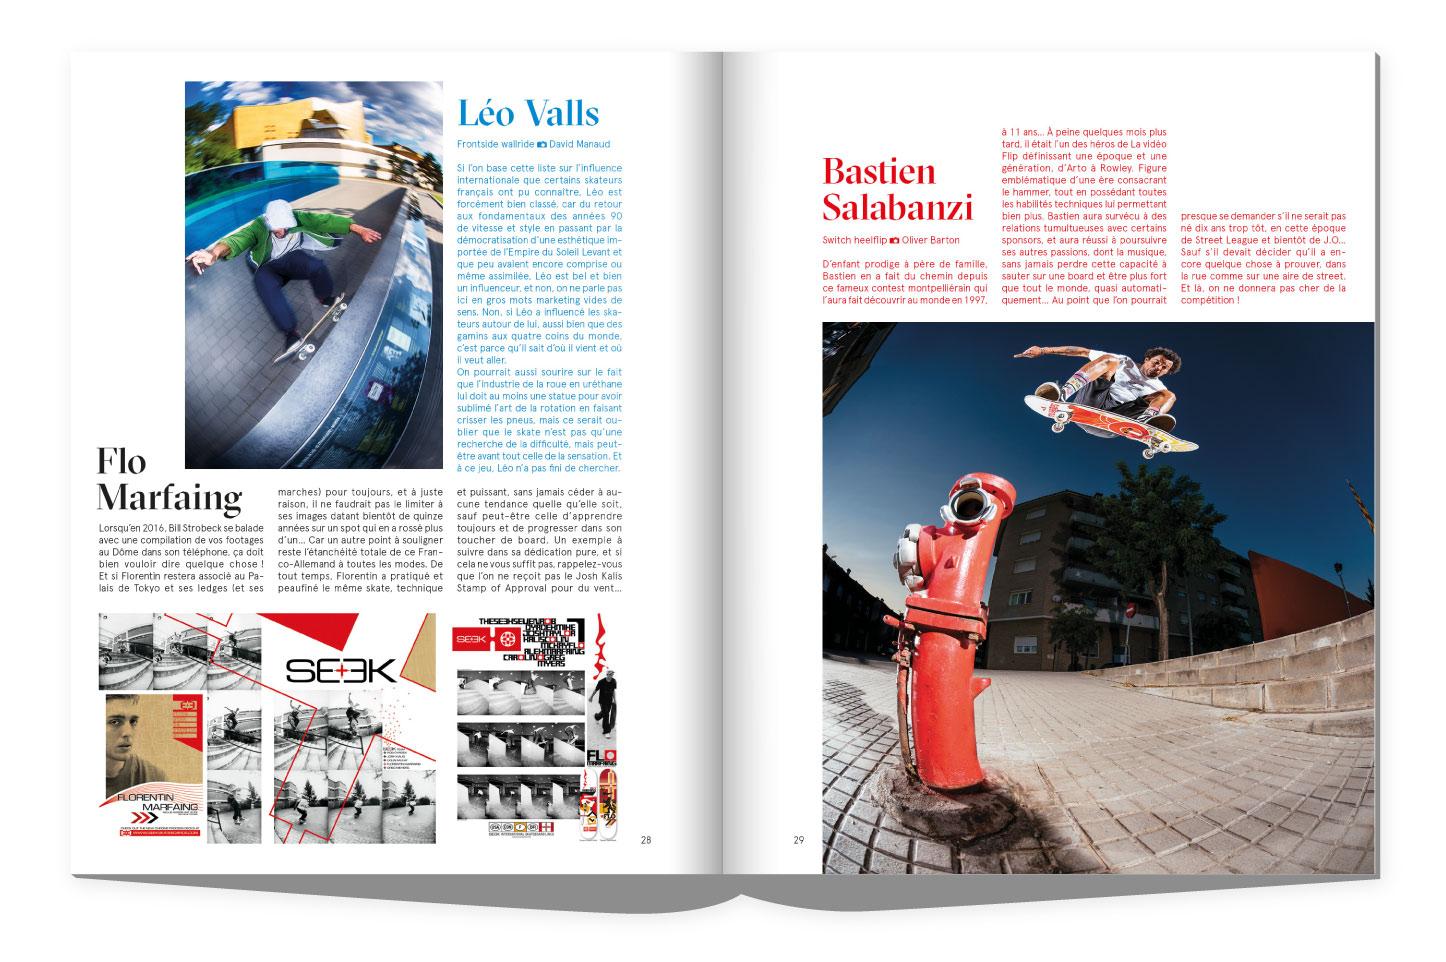 sugar-185-skateboard-magazine-léo-valls-bastien-slabanzi